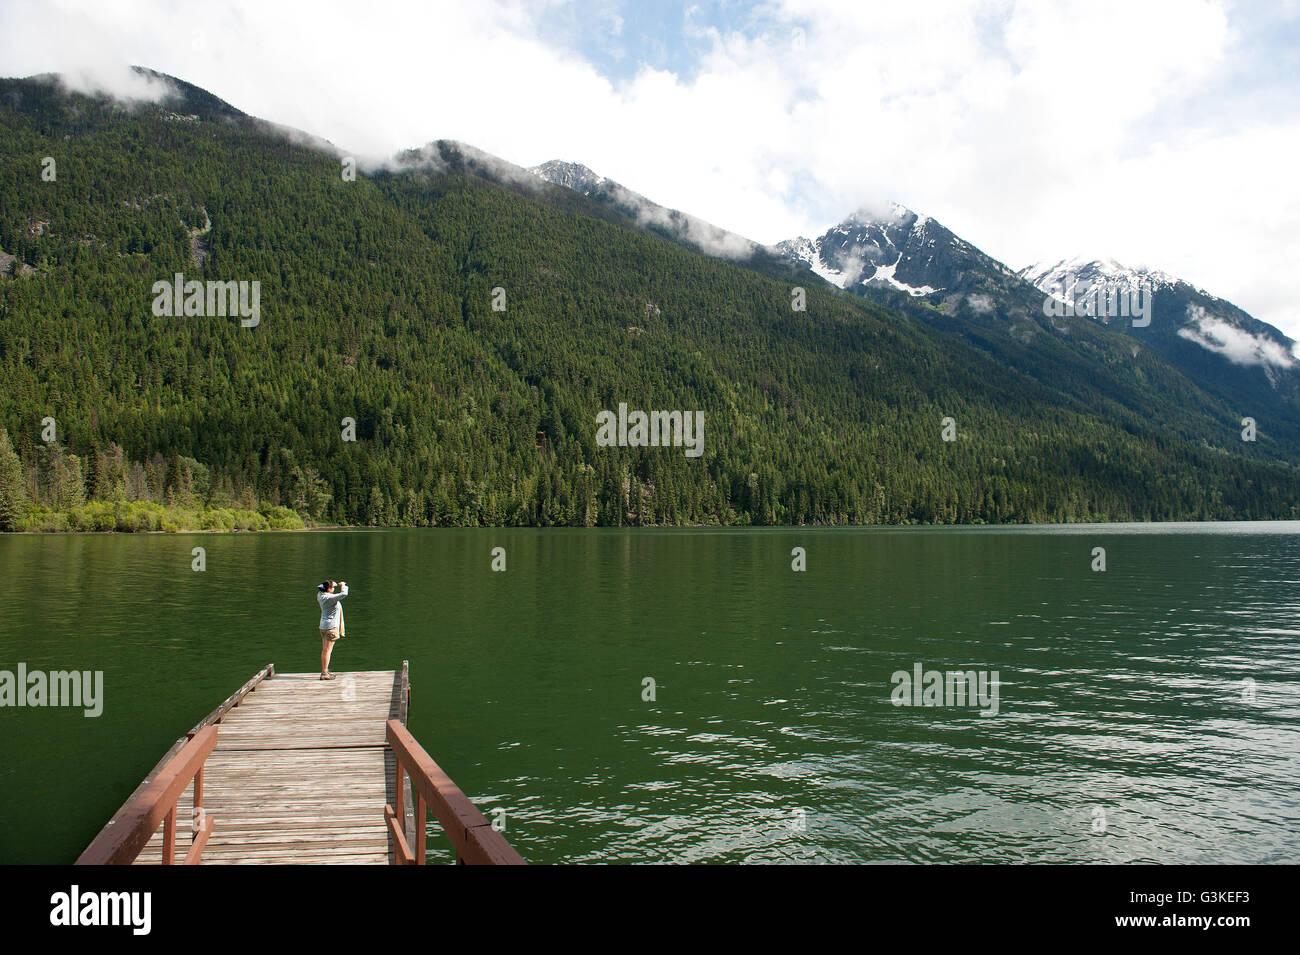 Birkenhead Provincial Park, north of Pemberton, British Columbia, Canada. - Stock Image